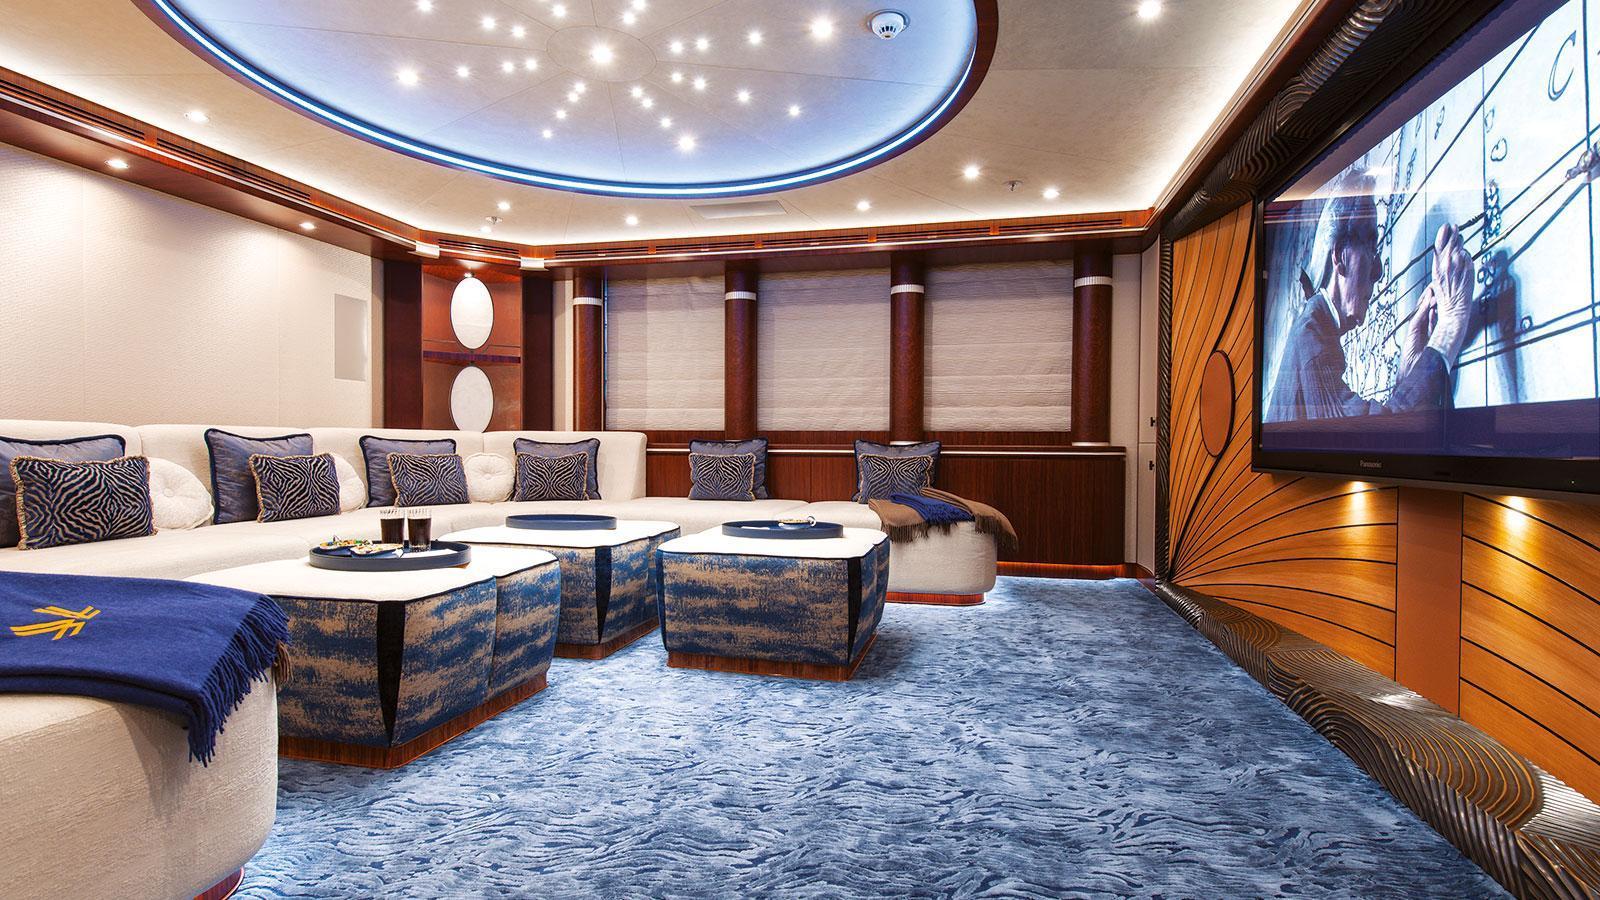 quattroelle-motor-yacht-lurssen-2013-86m-cinema